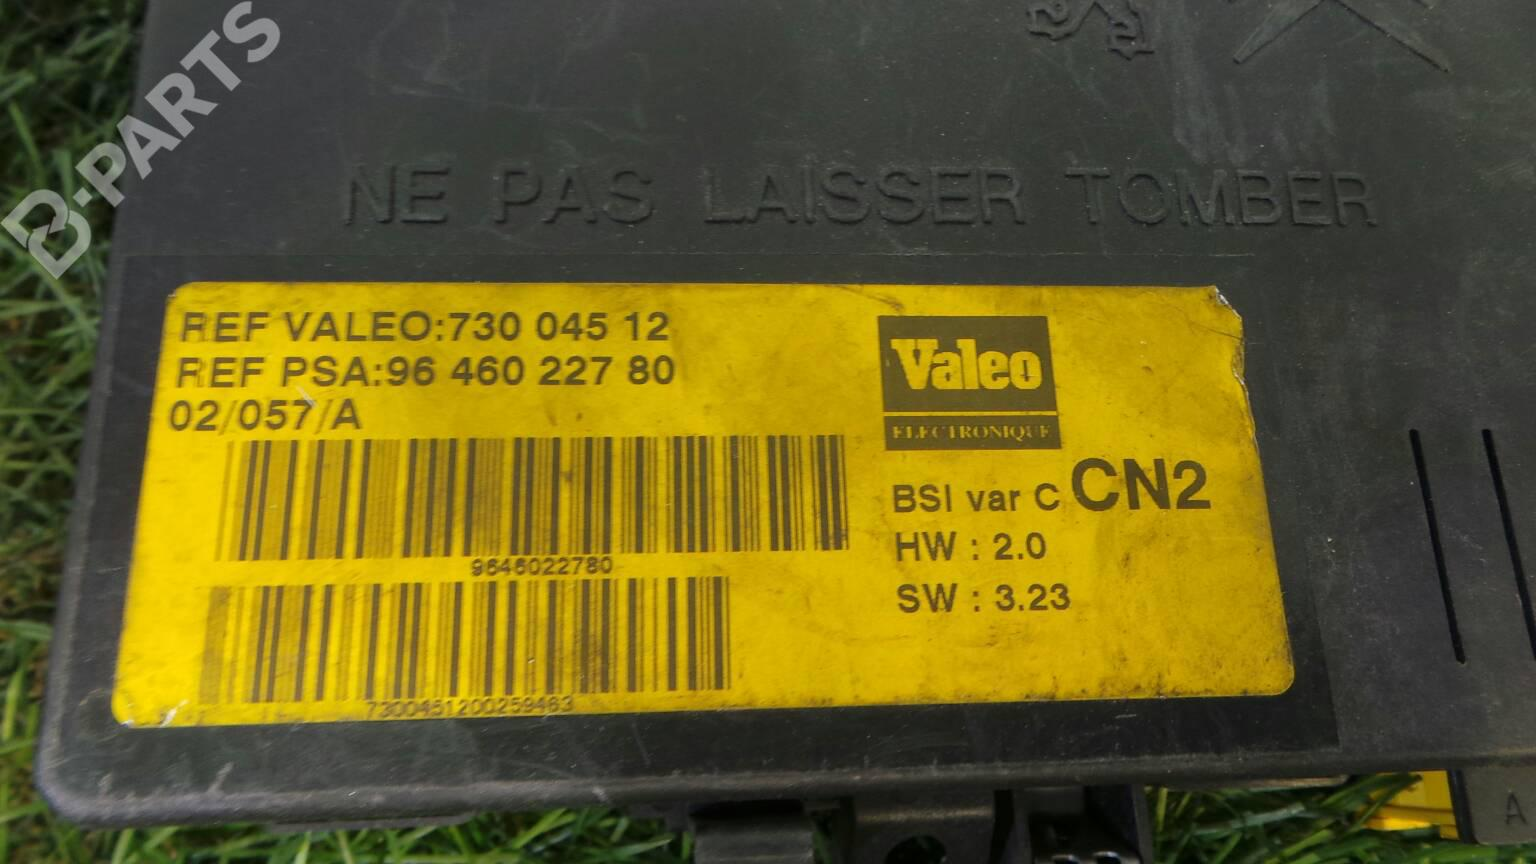 hight resolution of fuse box 96 460 227 80 citro n xsara n1 2 0 hdi 90